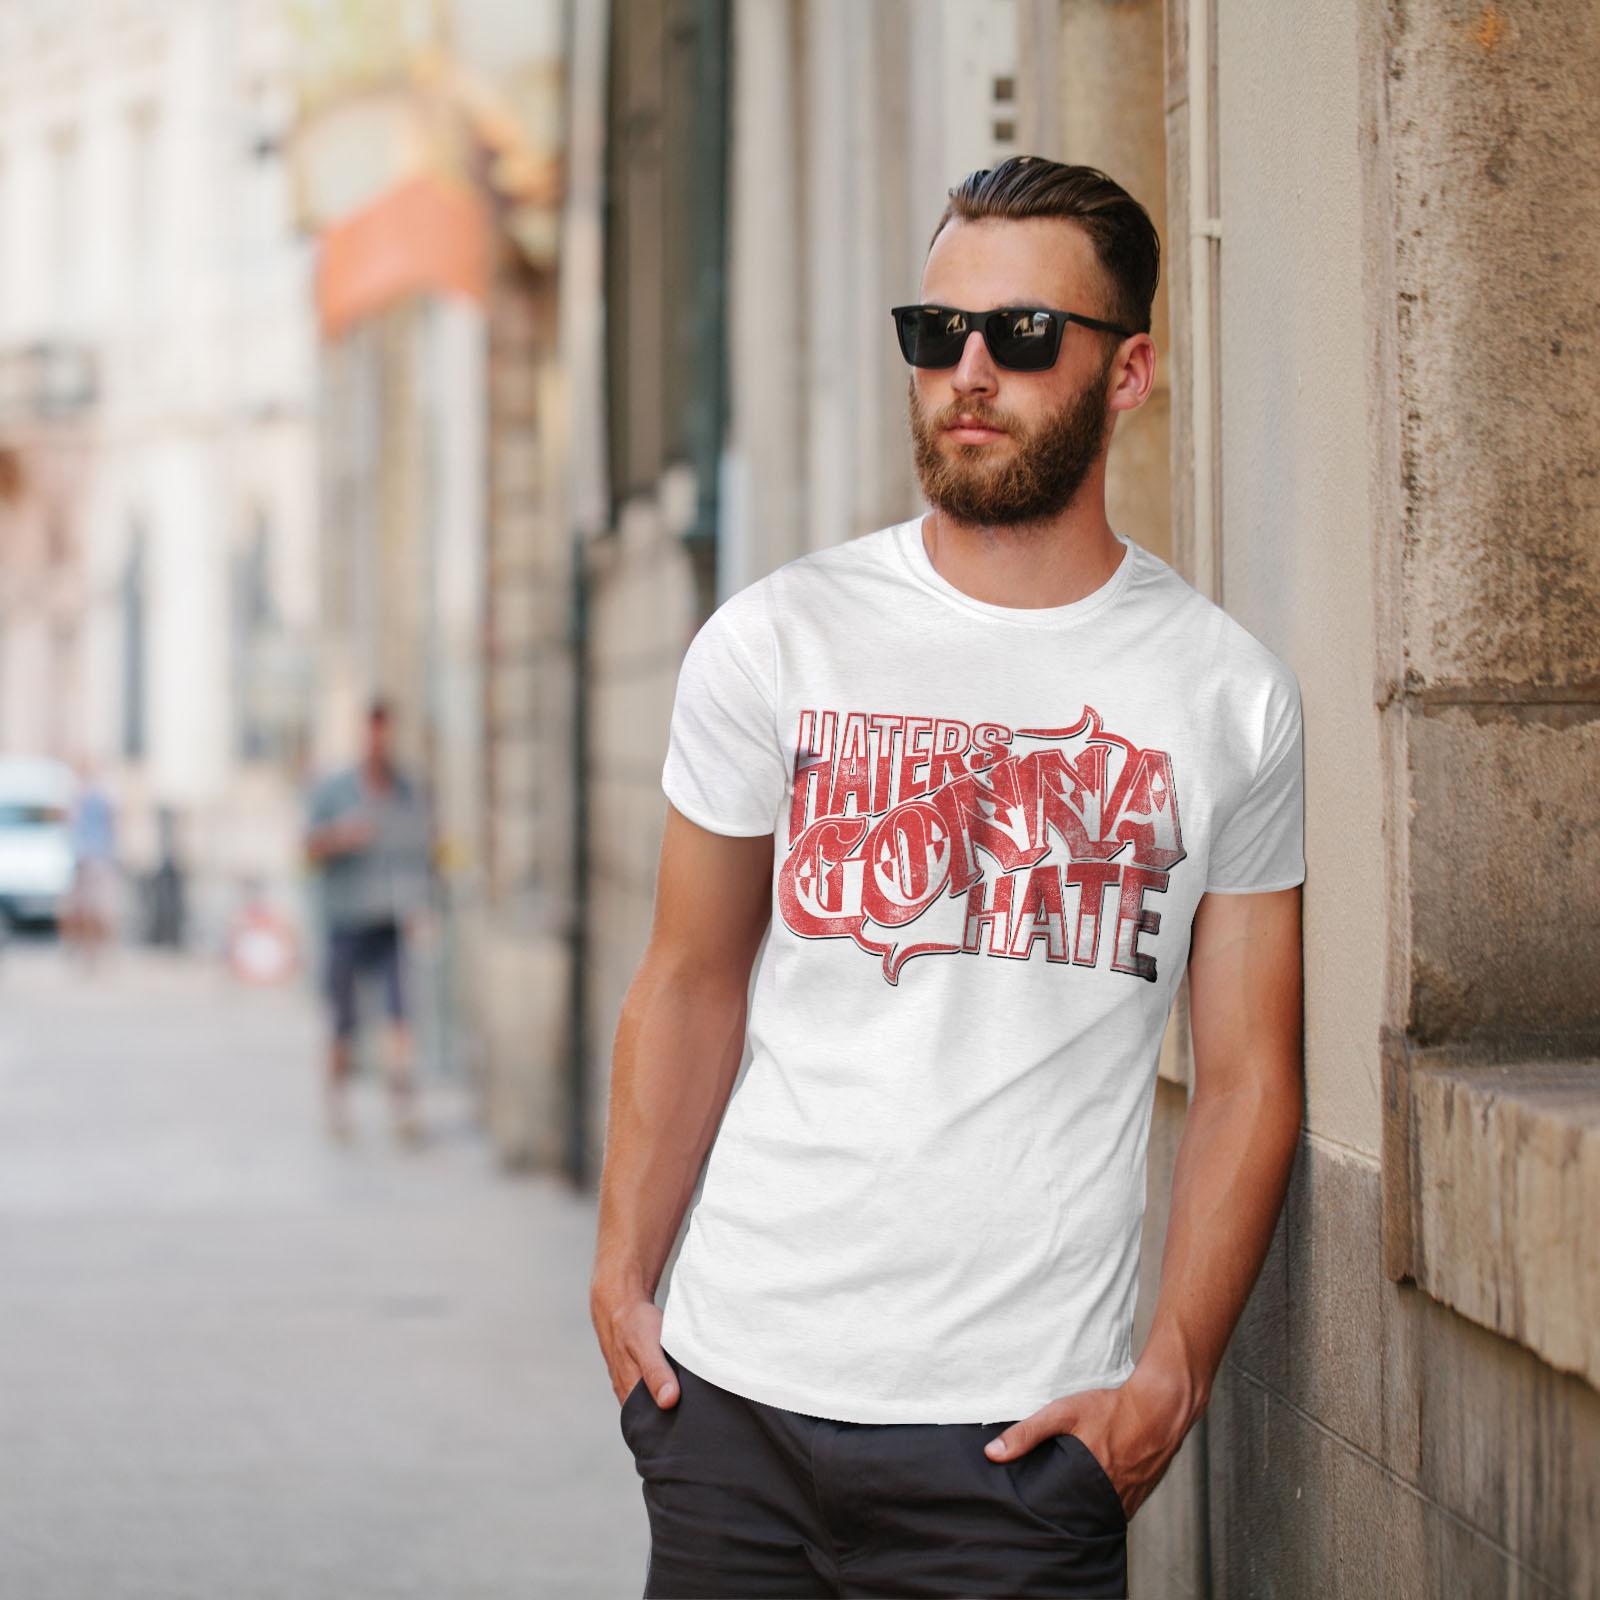 Wellcoda-Wasser-hassen-Zitat-Slogan-Herren-T-Shirt-True-Grafikdesign-Printed-Tee Indexbild 11